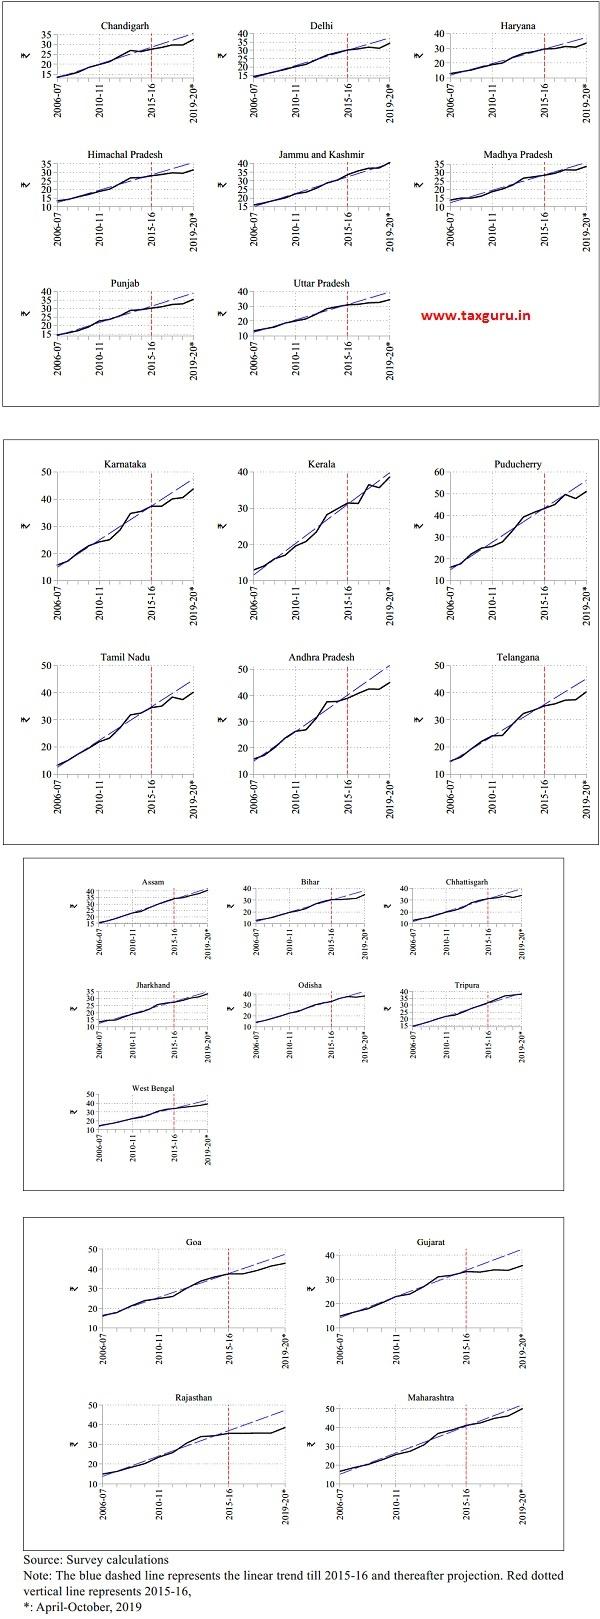 Statewise Prices of Non-Vegetarian Thali